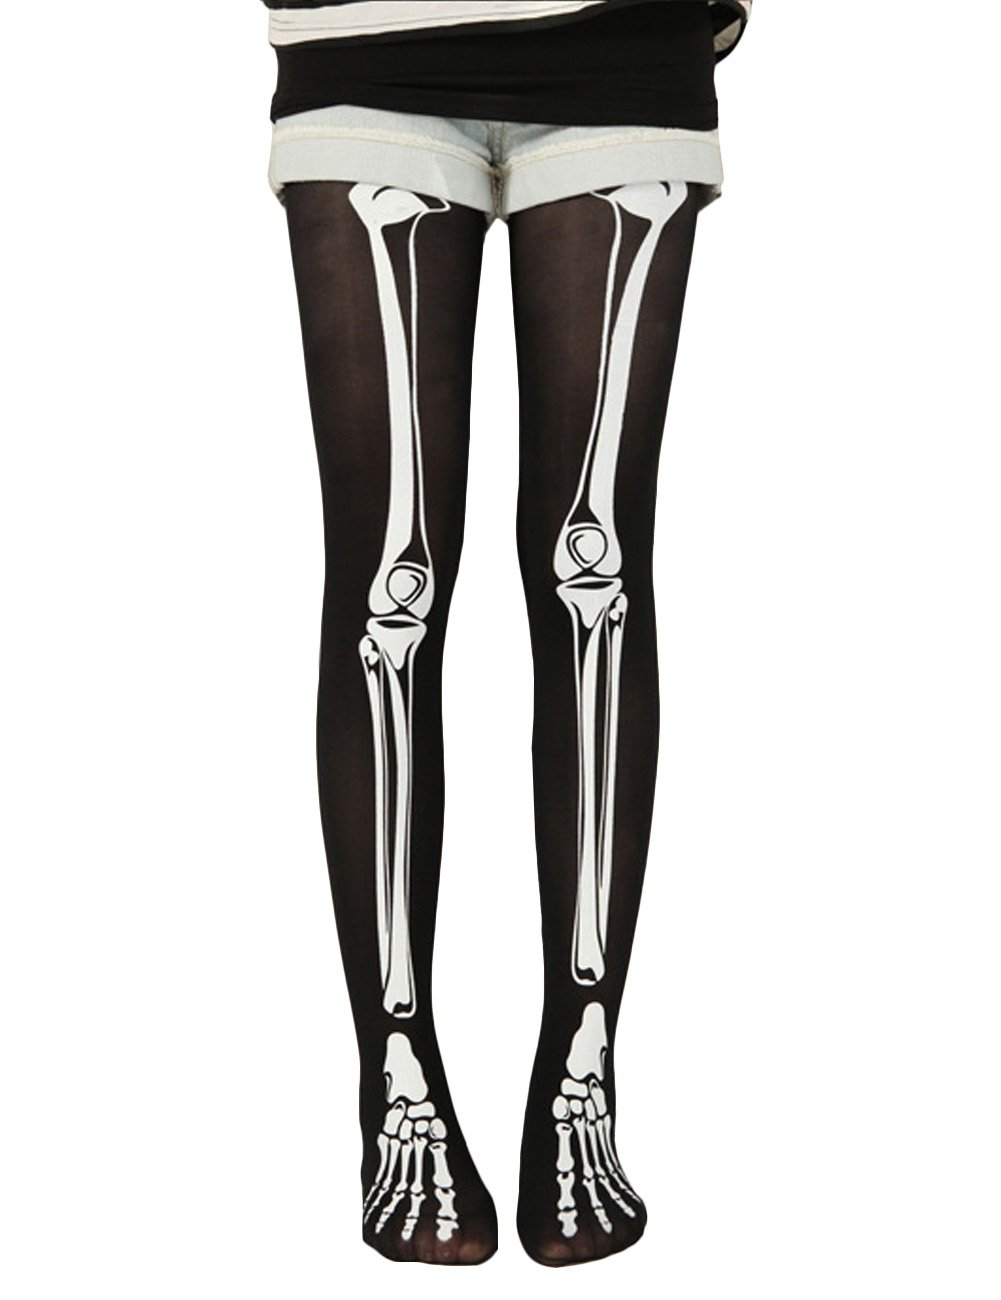 THEE Socks Skeleton Stockings Halloween Costume